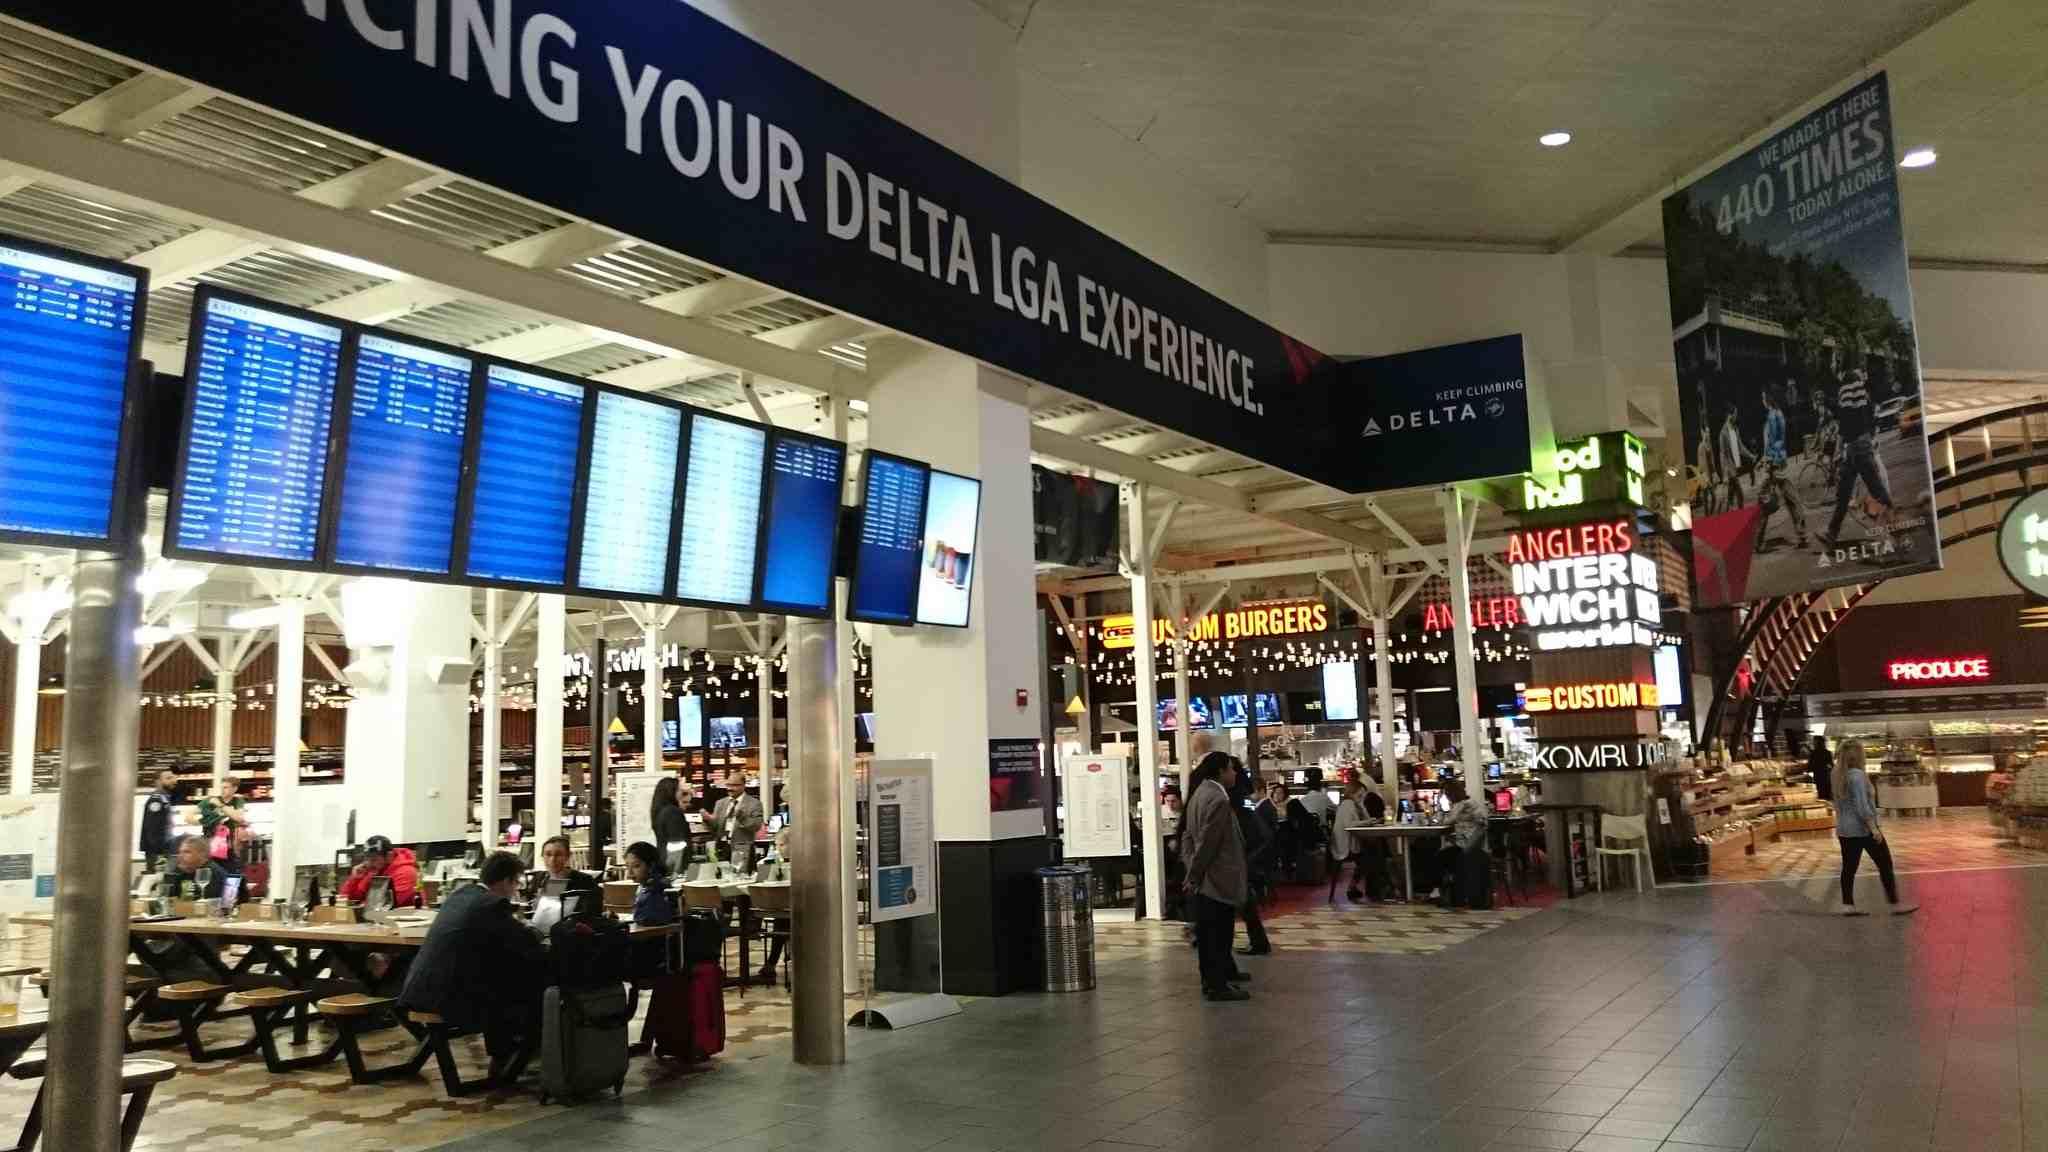 A LaGuardia Airport food court.